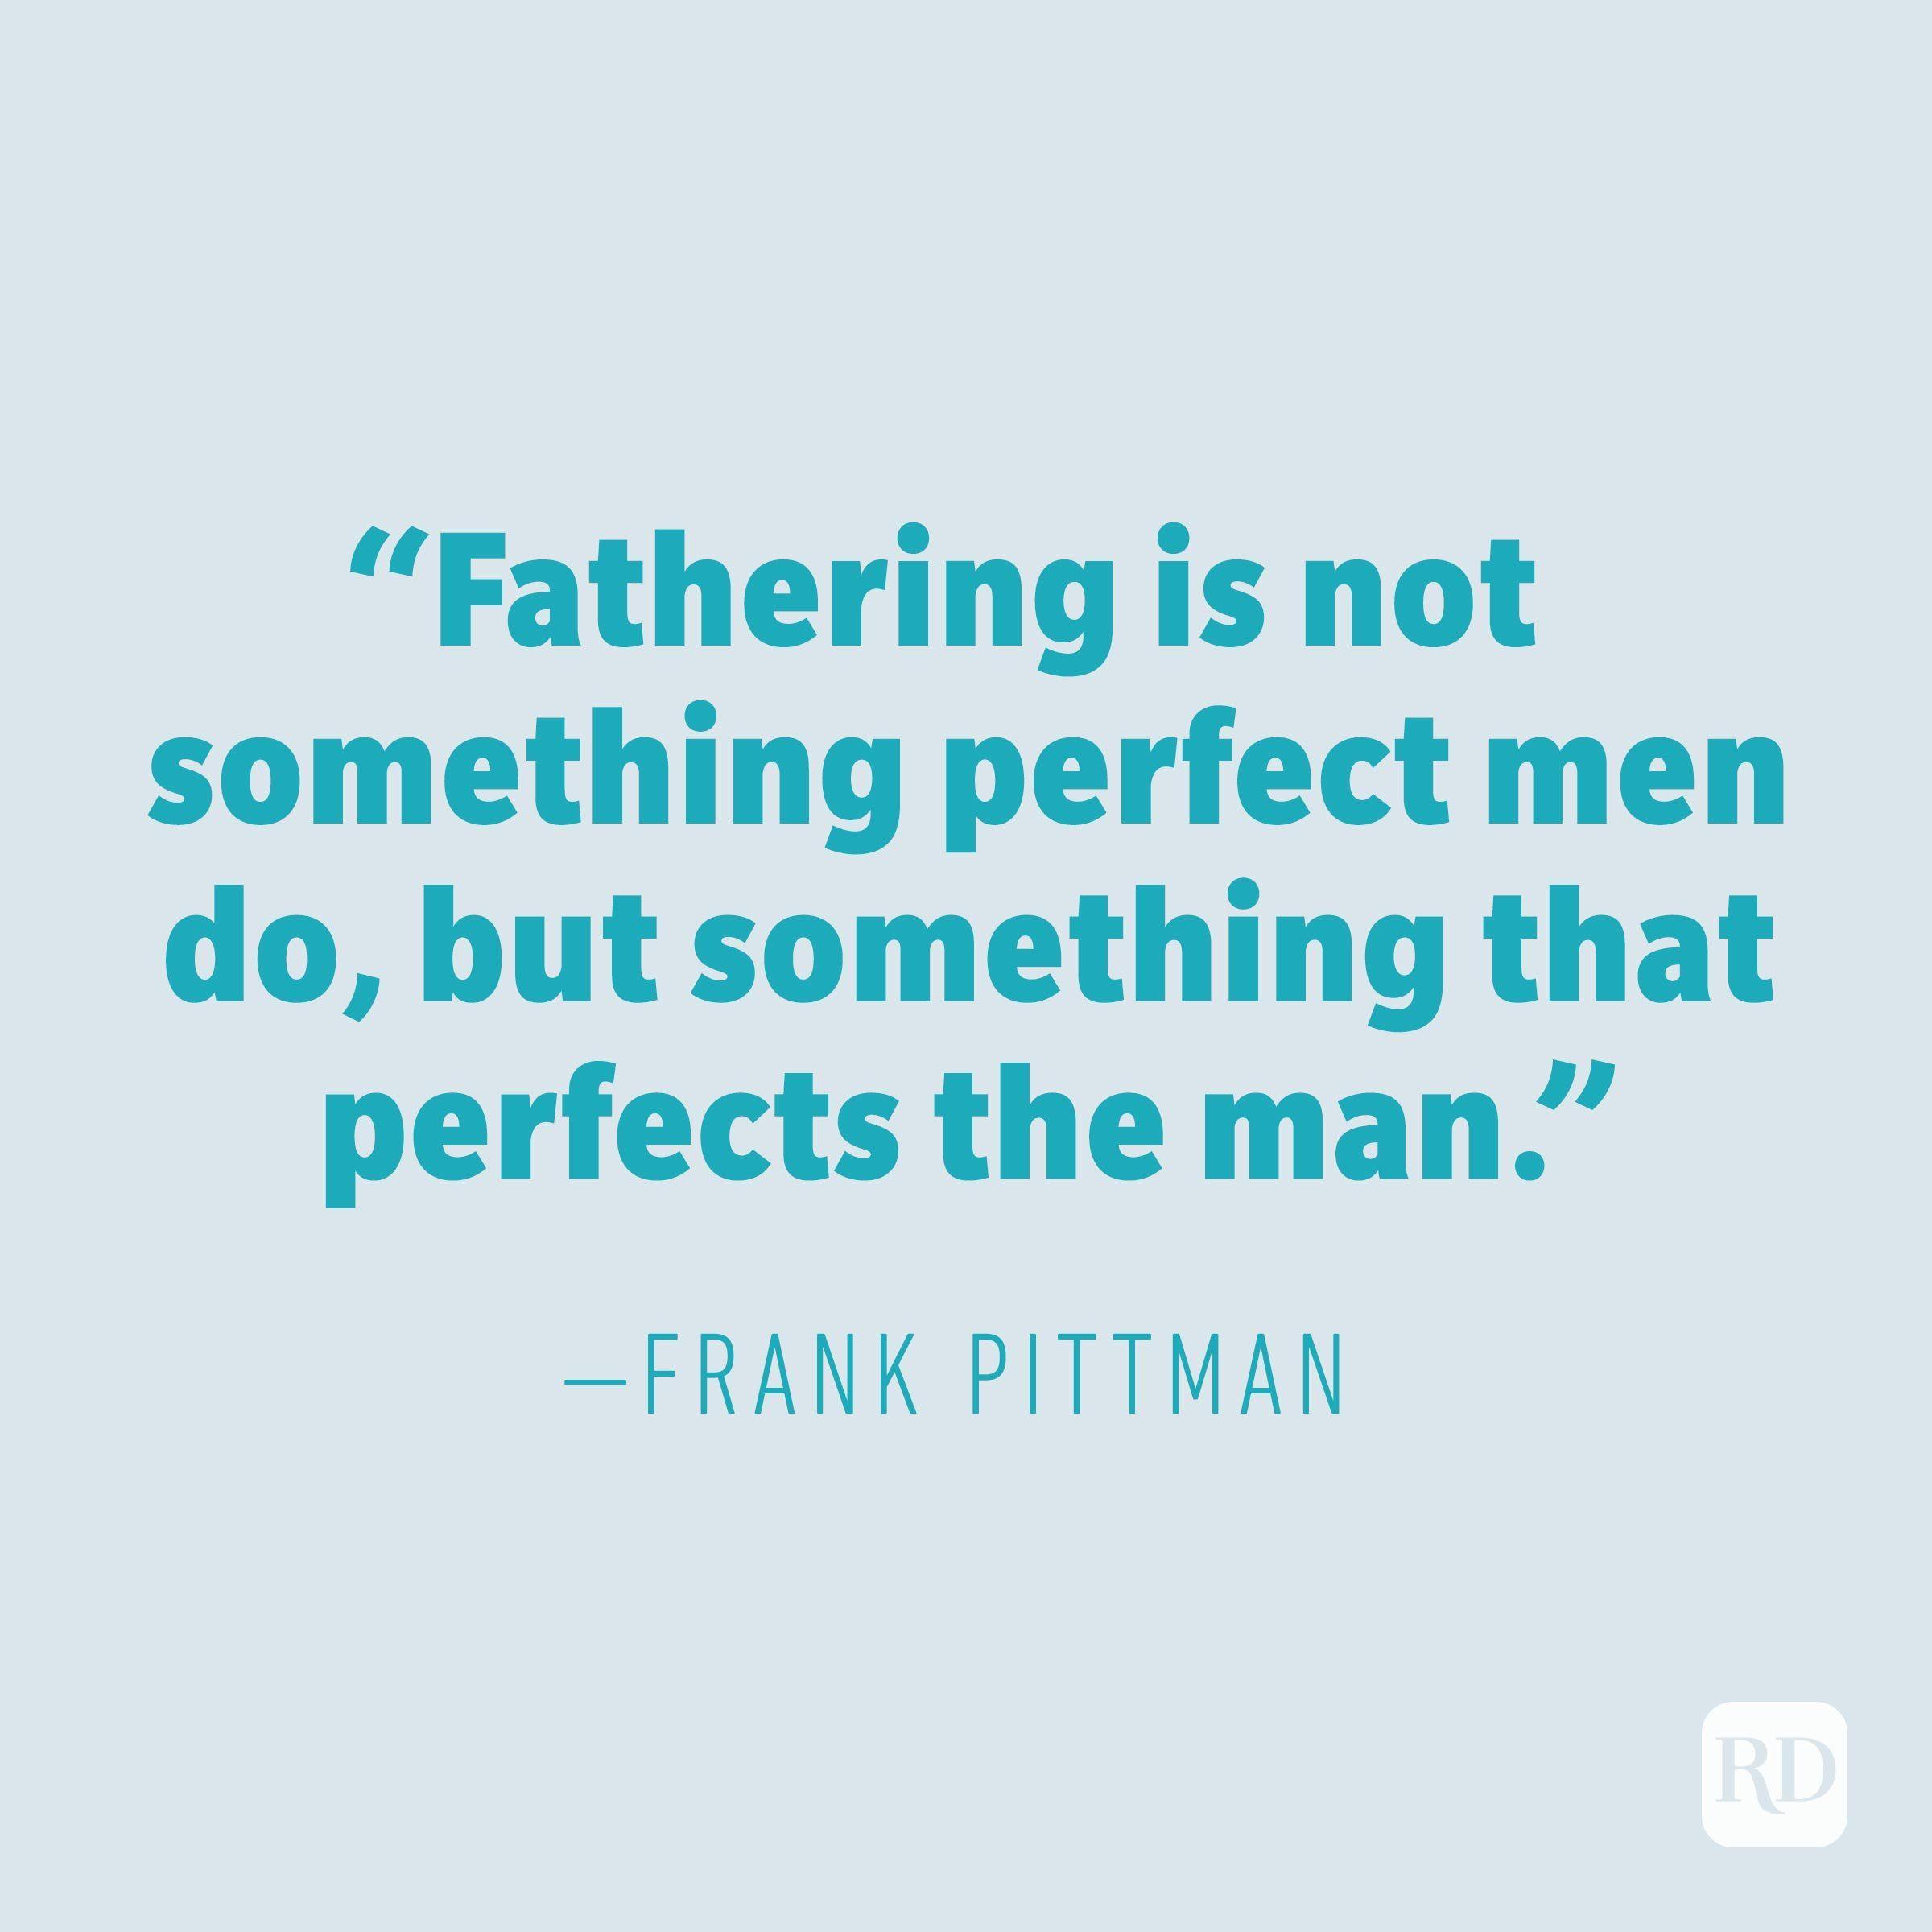 Frank Pittman quote